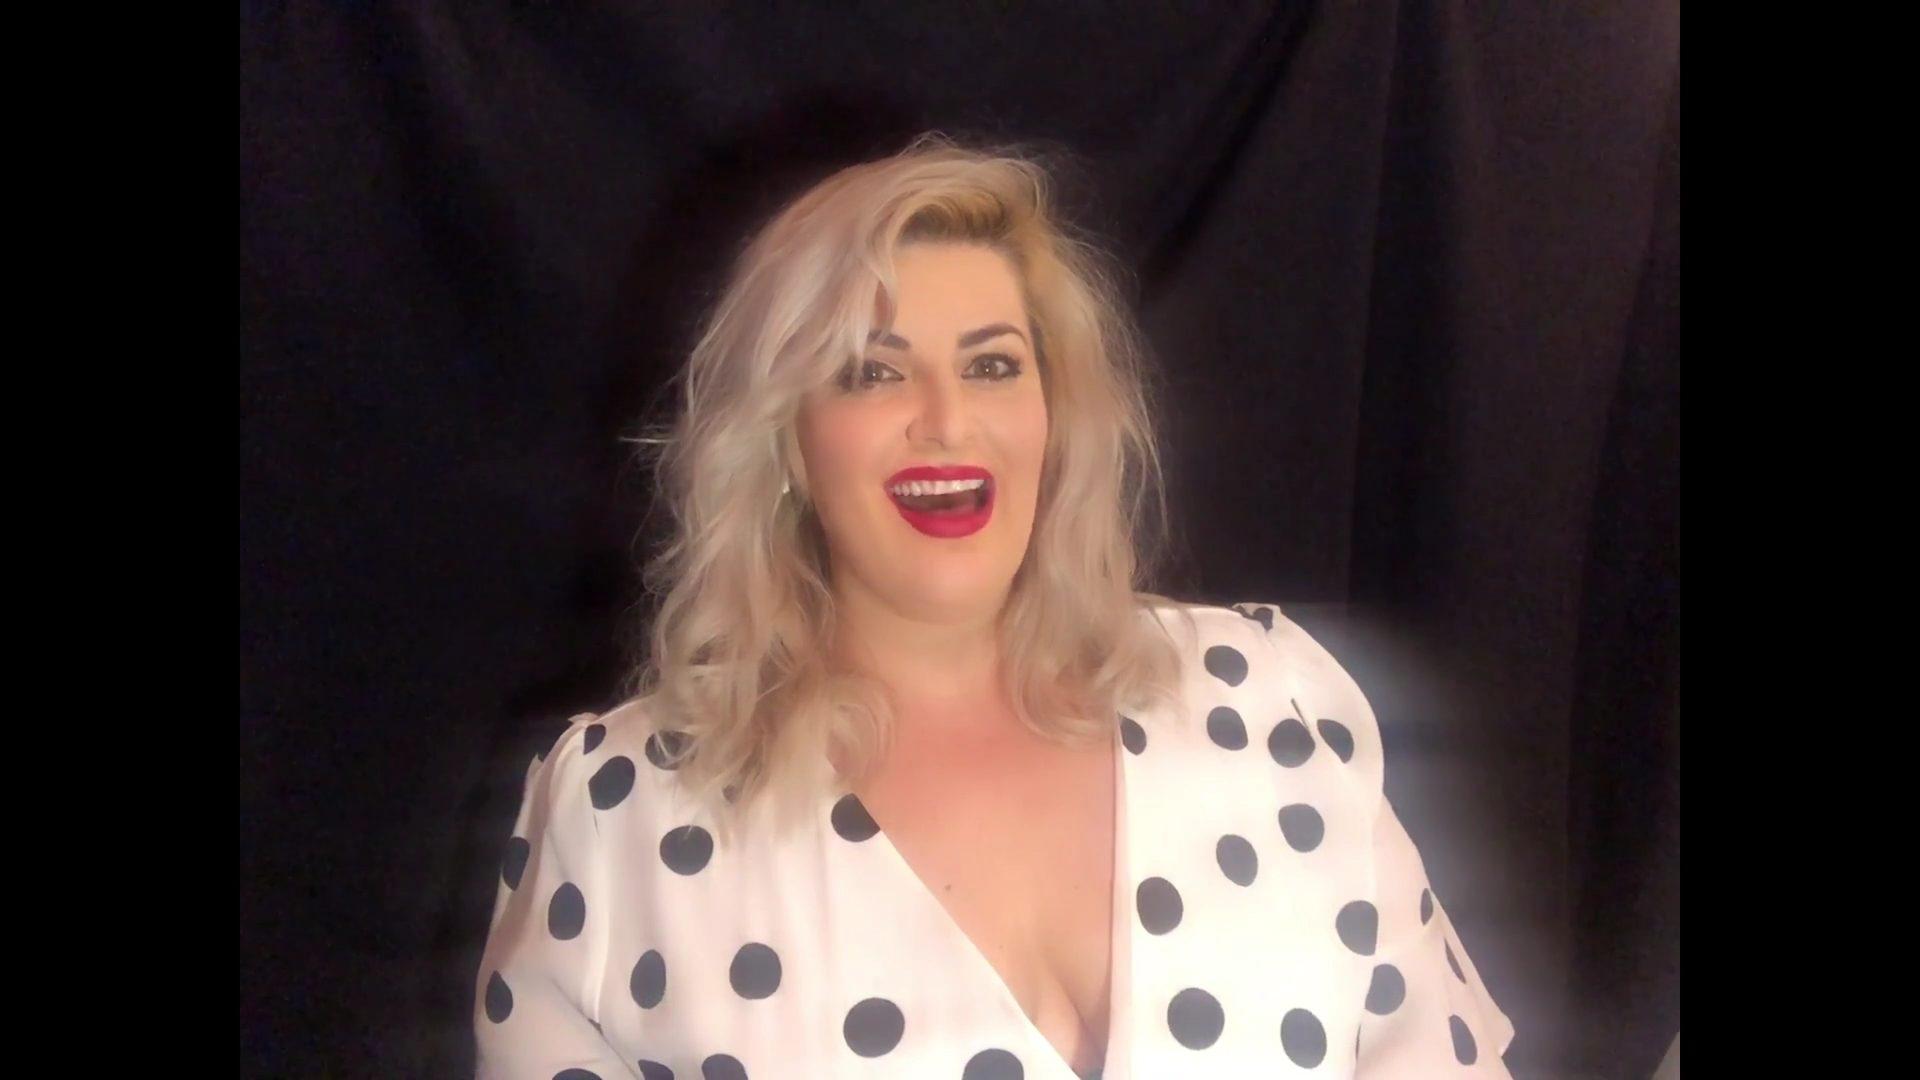 Jodie Prenger joins via video link